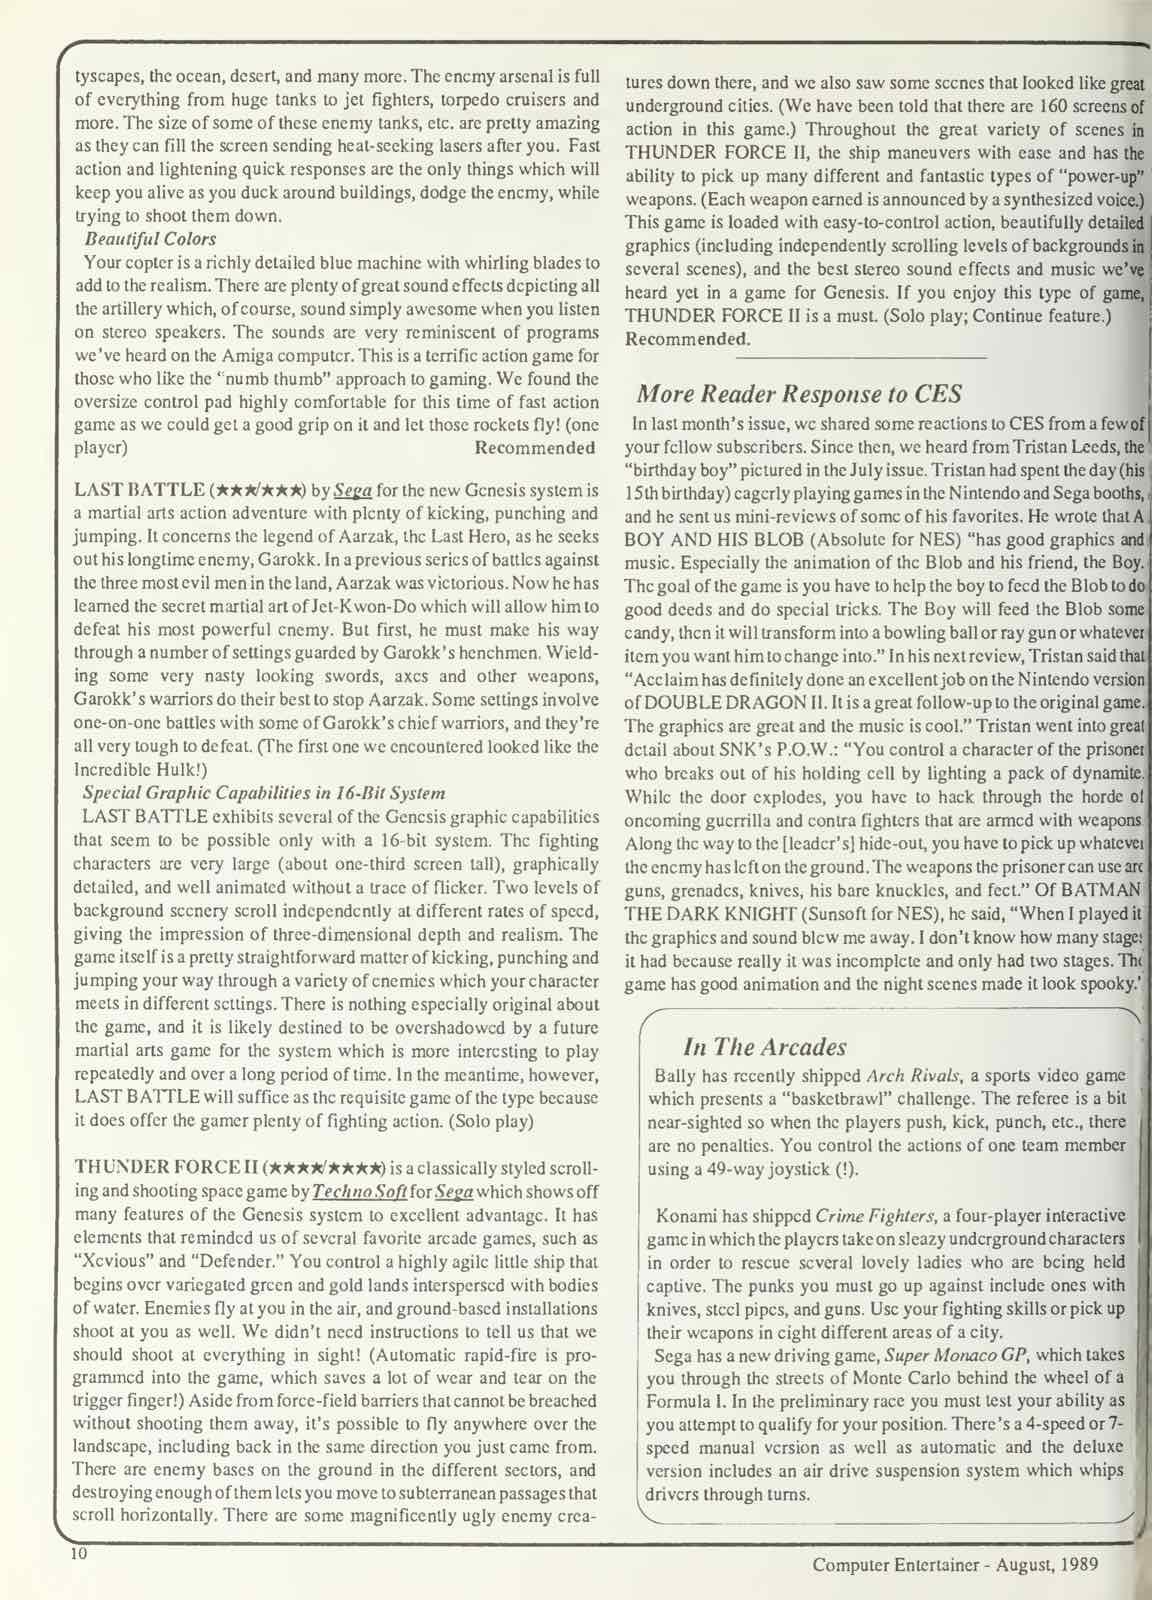 Computer Entertainer | August 1989 p10